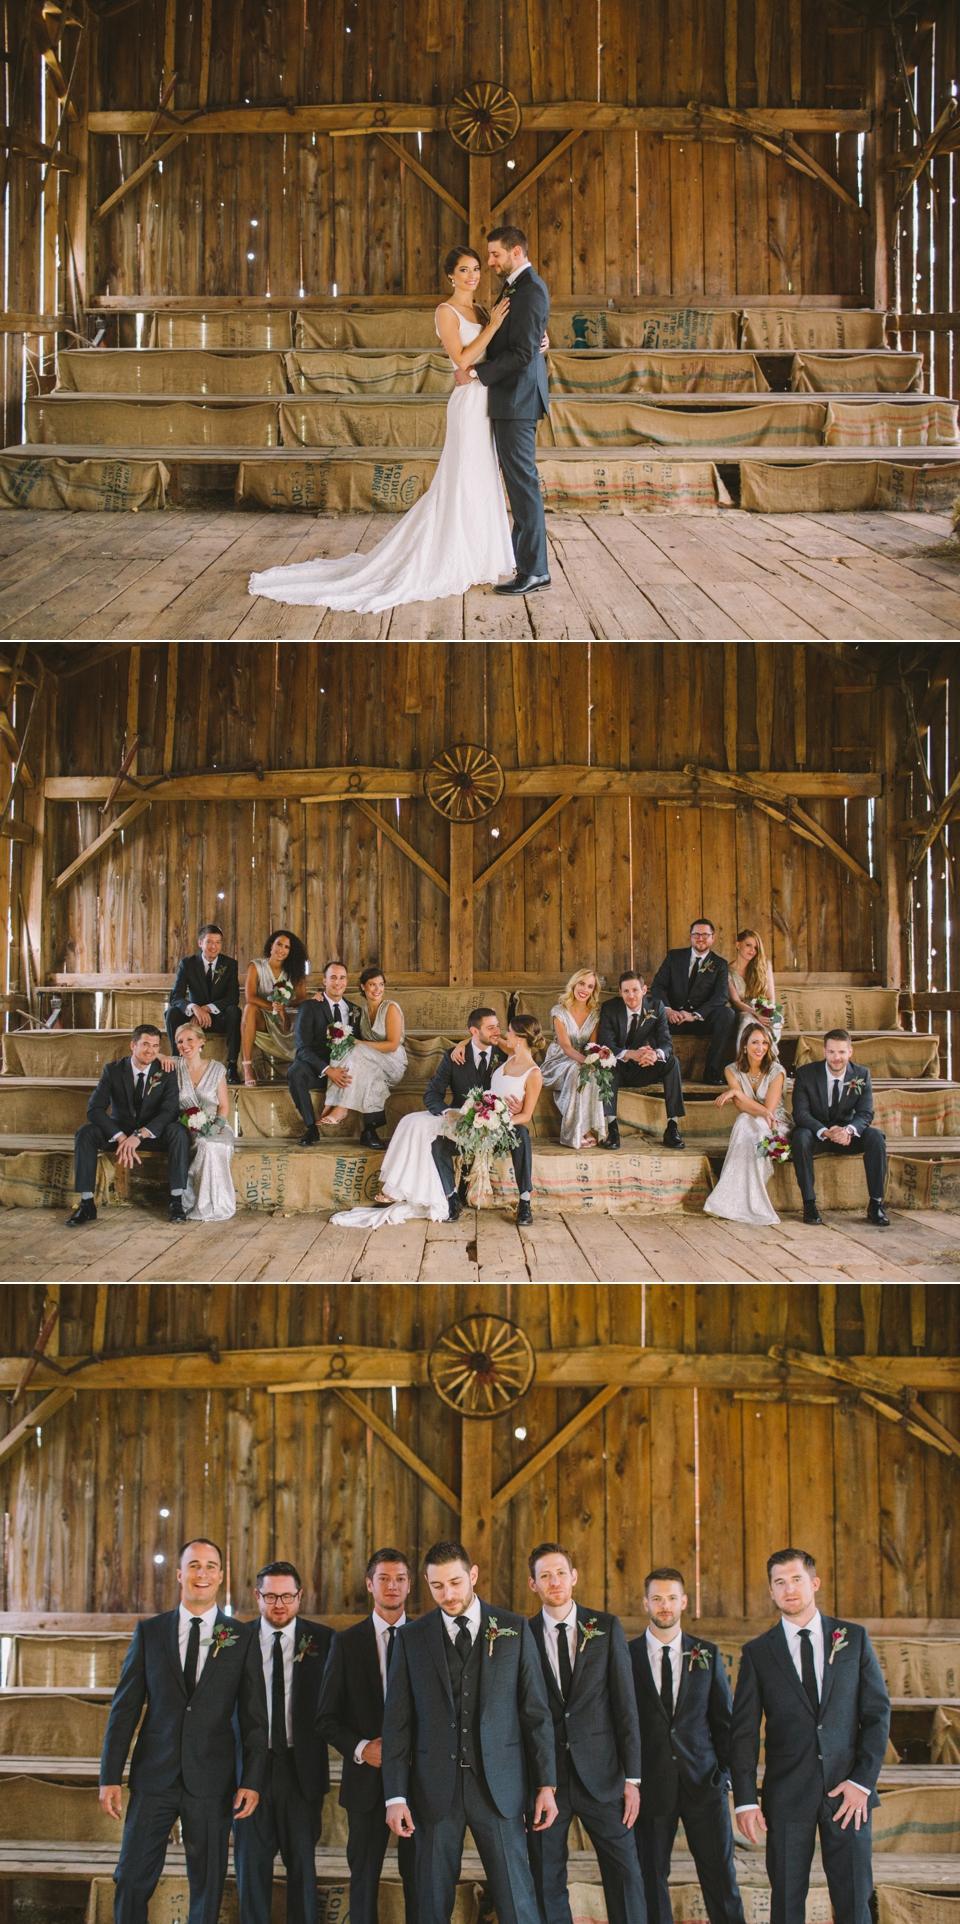 Becker Farms Wedding Aj 2017 0005